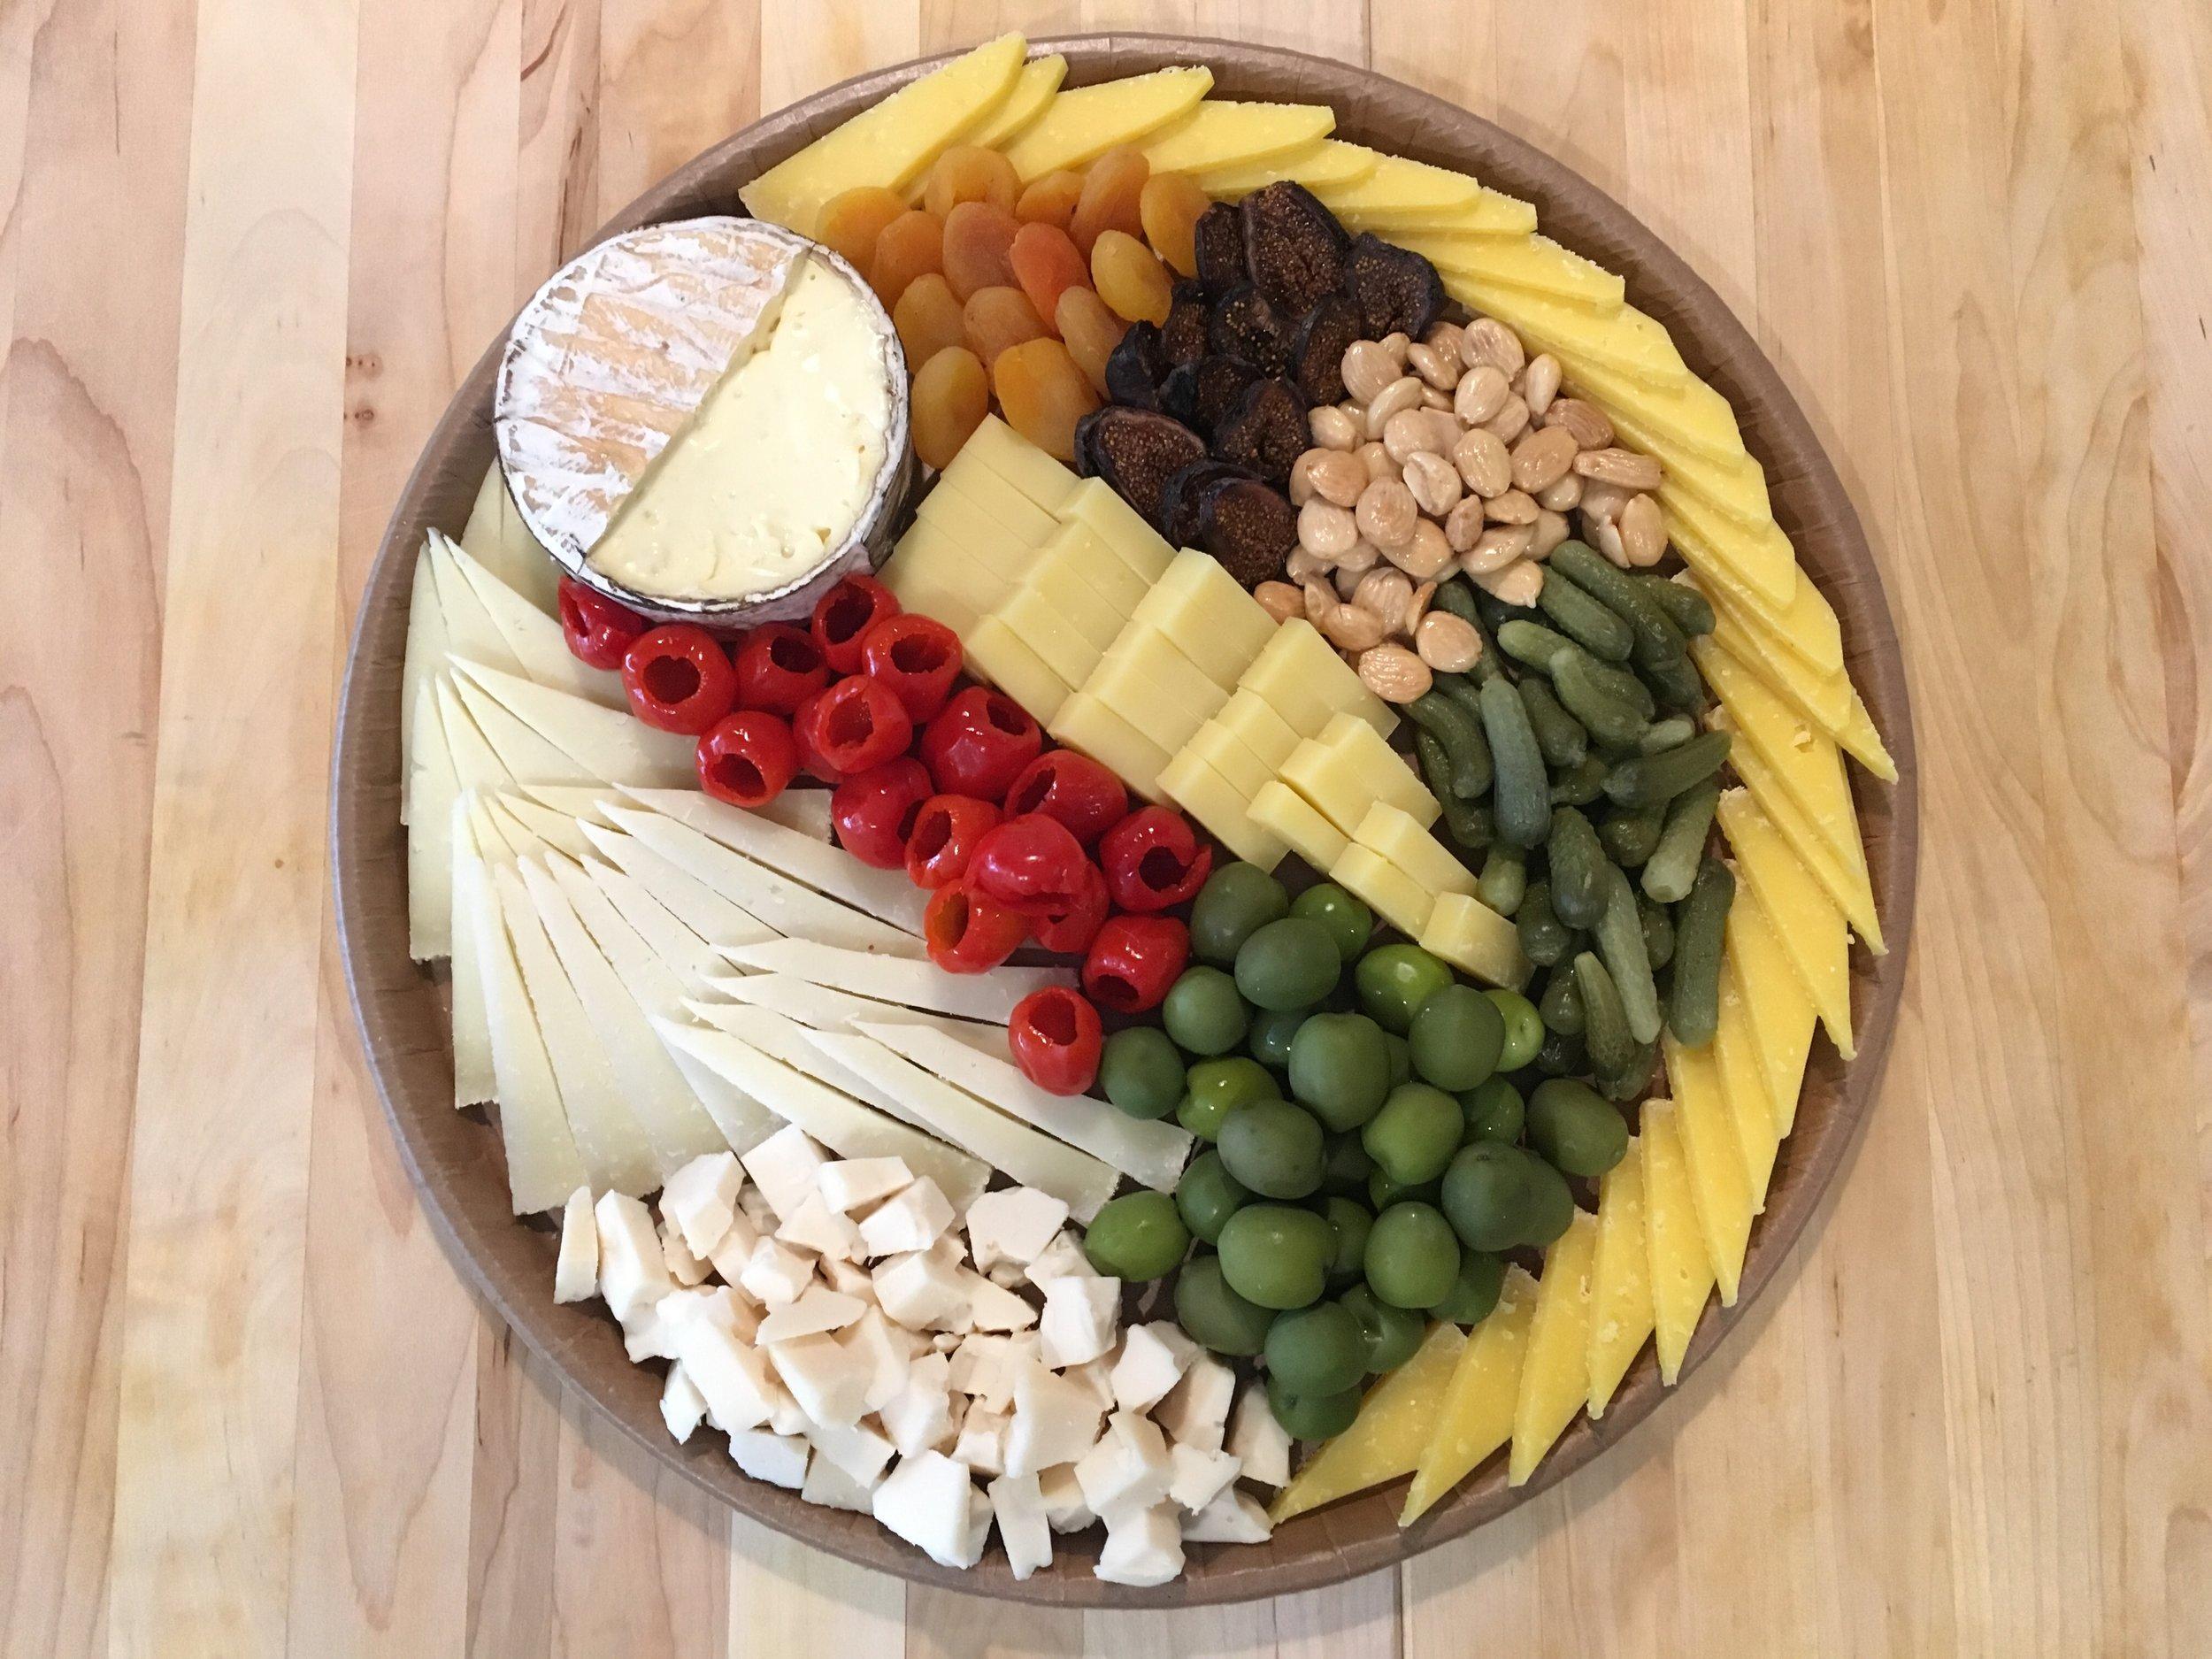 20 person board, all cheese